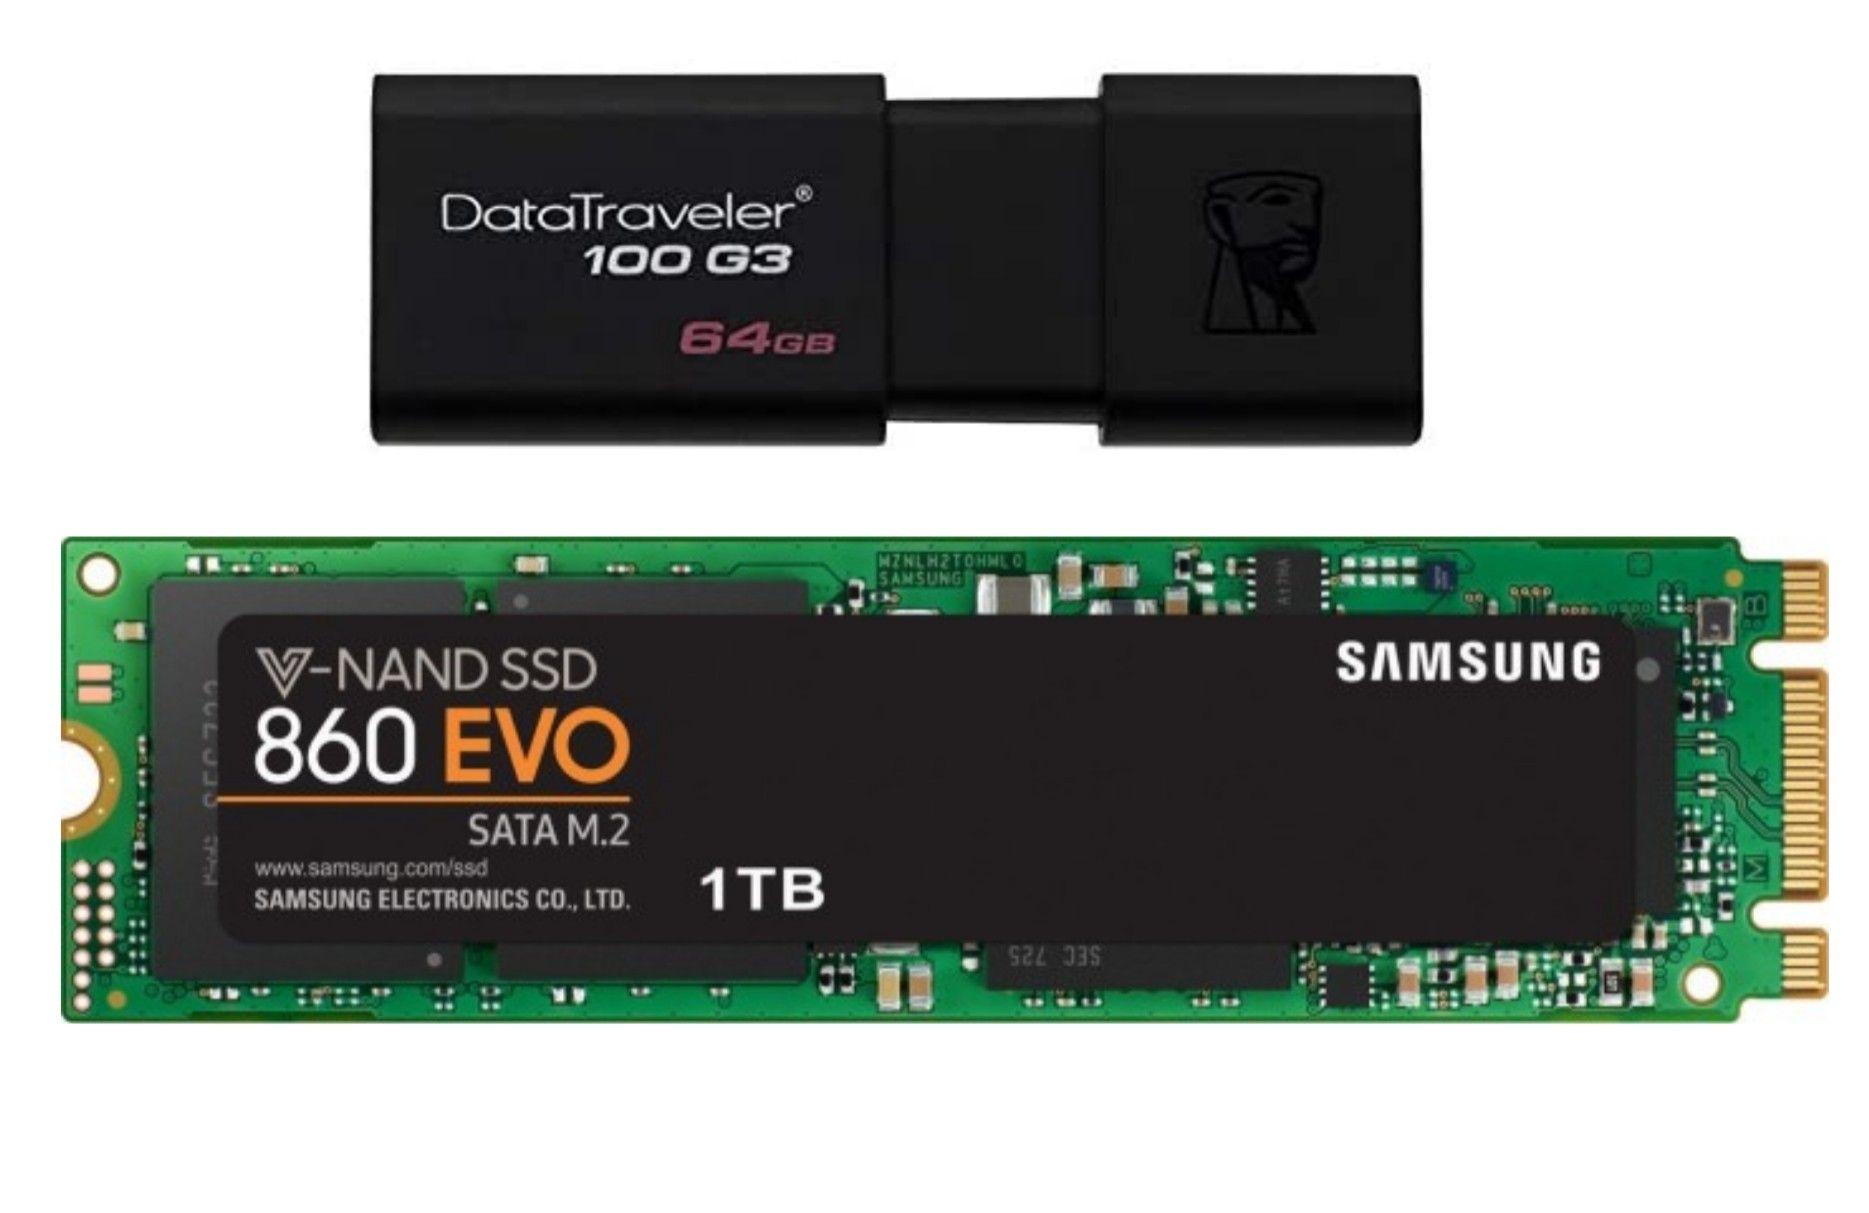 [Saturn] Samsung 860 EVO 1TB M.2 SATA SSD (3D TLC, 1GB DRAM, AES, 5 Jahre Garantie)